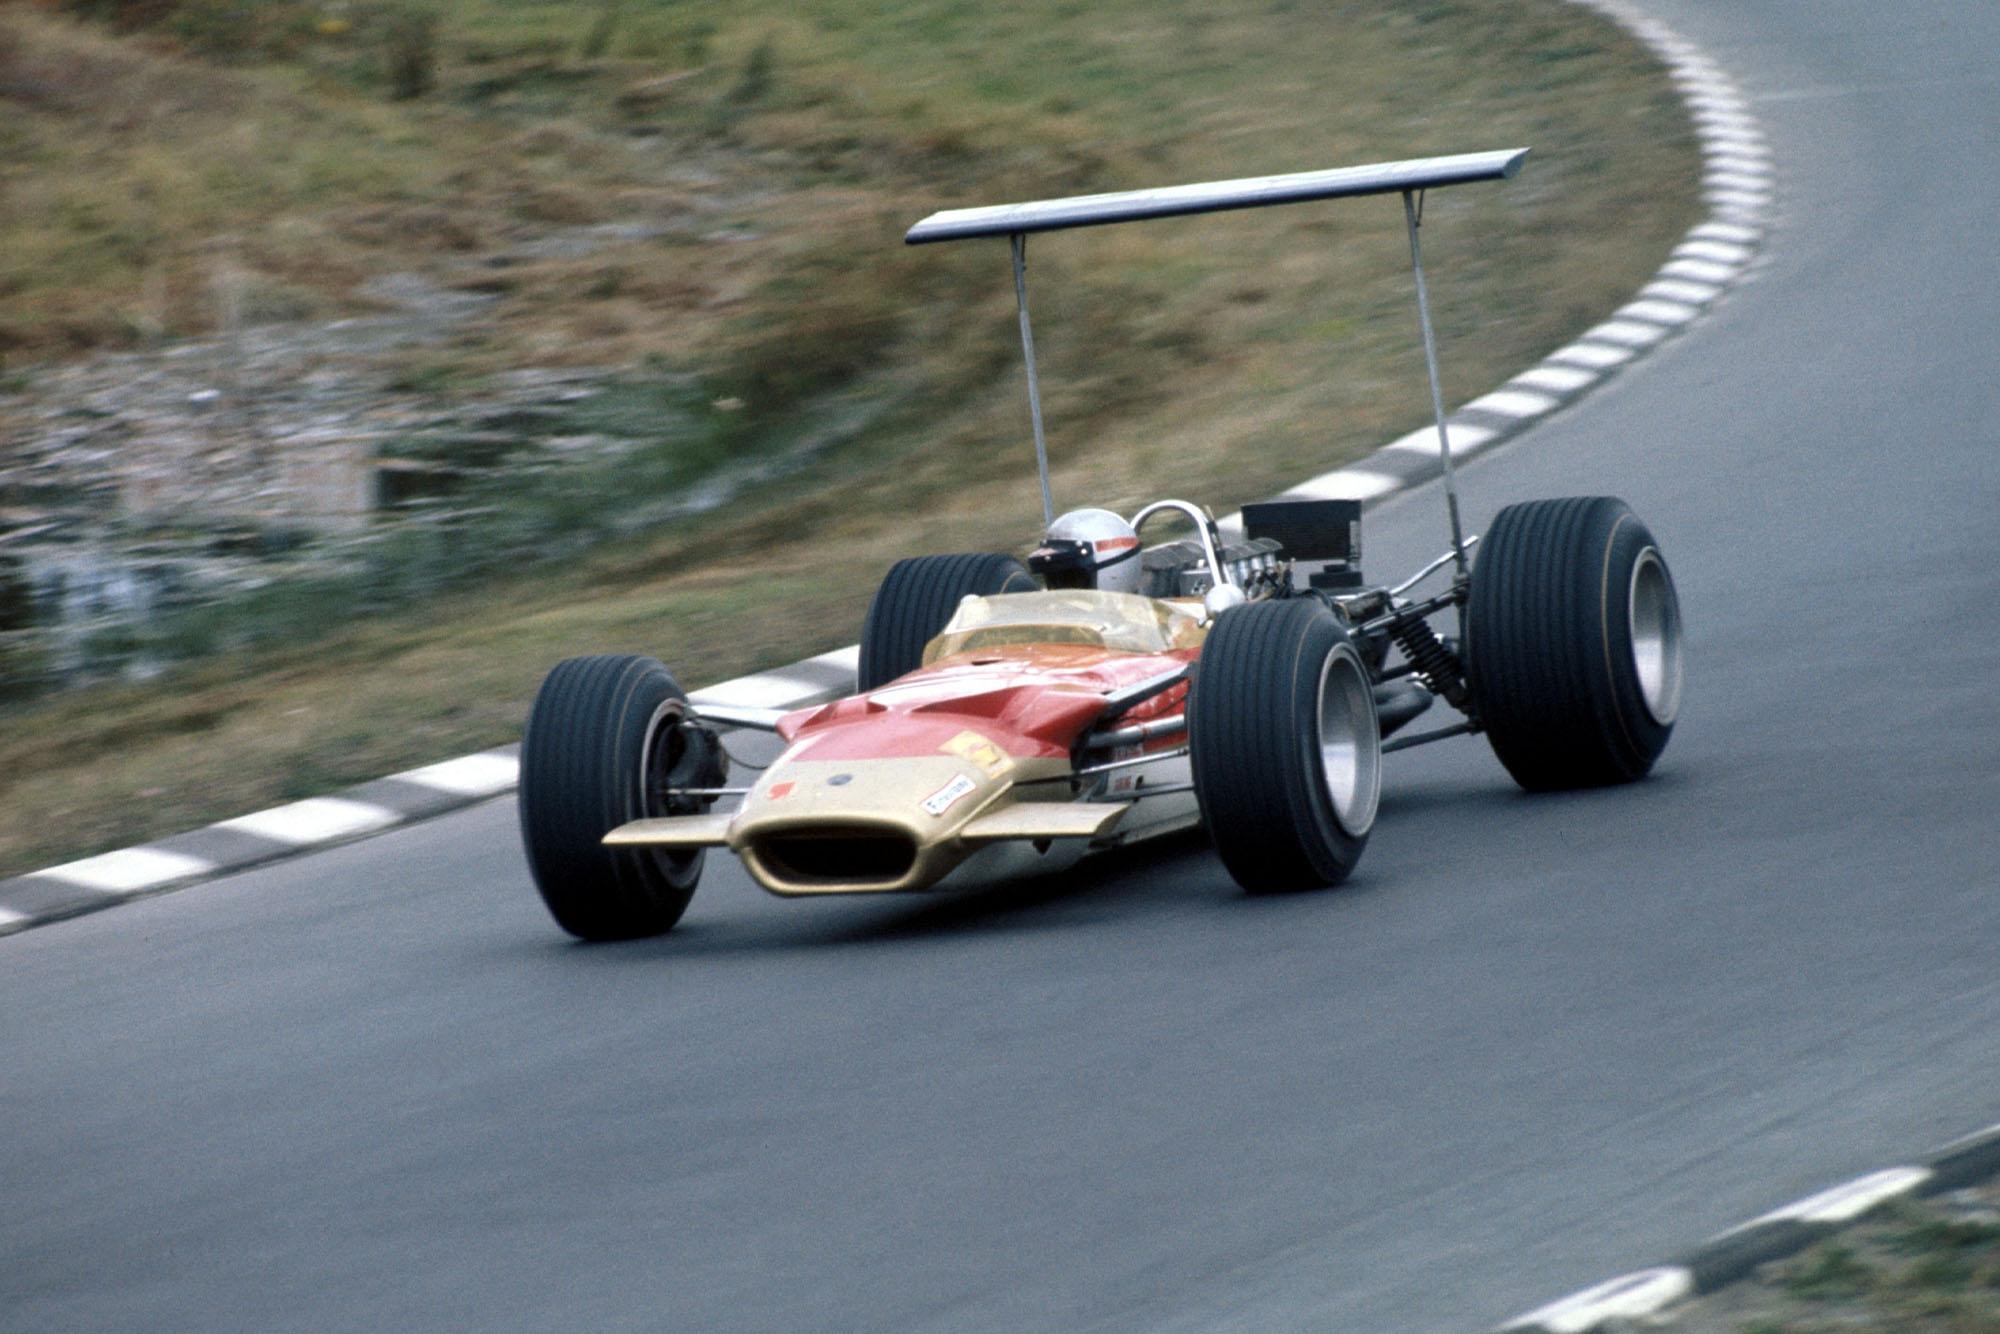 Mario Andretti in his Lotus at the 1968 United States Grand Prix